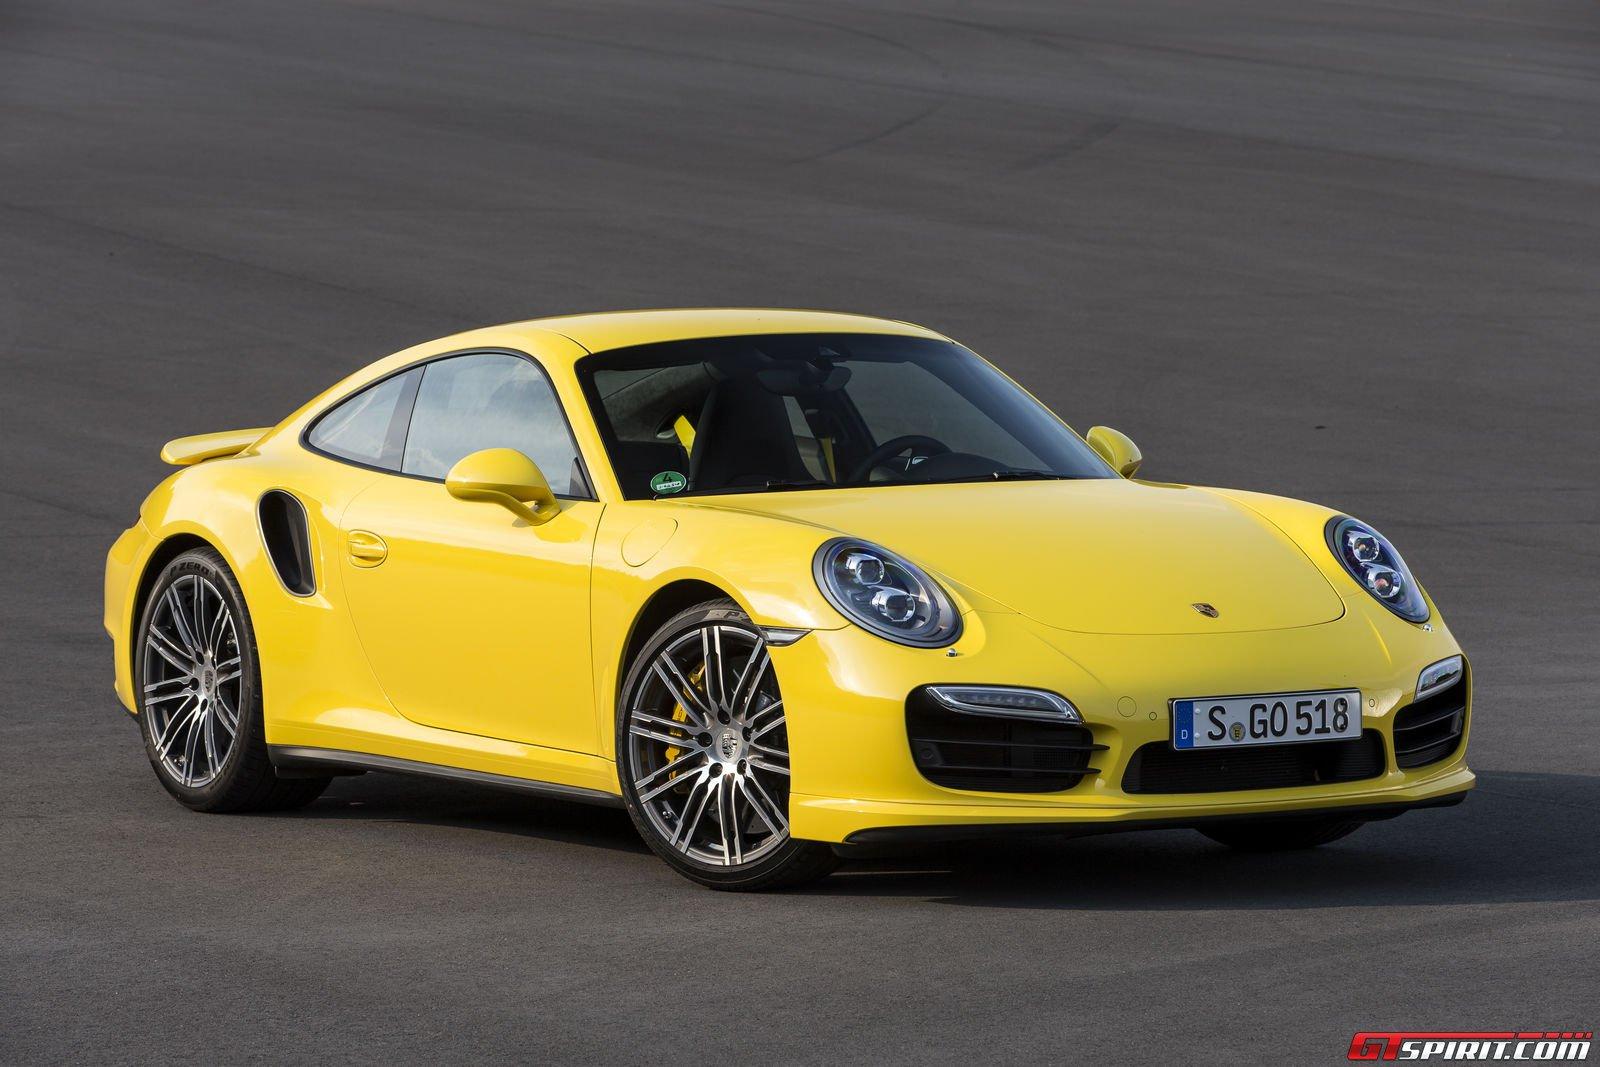 Road Test 2014 Porsche 991 Turbo Turbo S Review